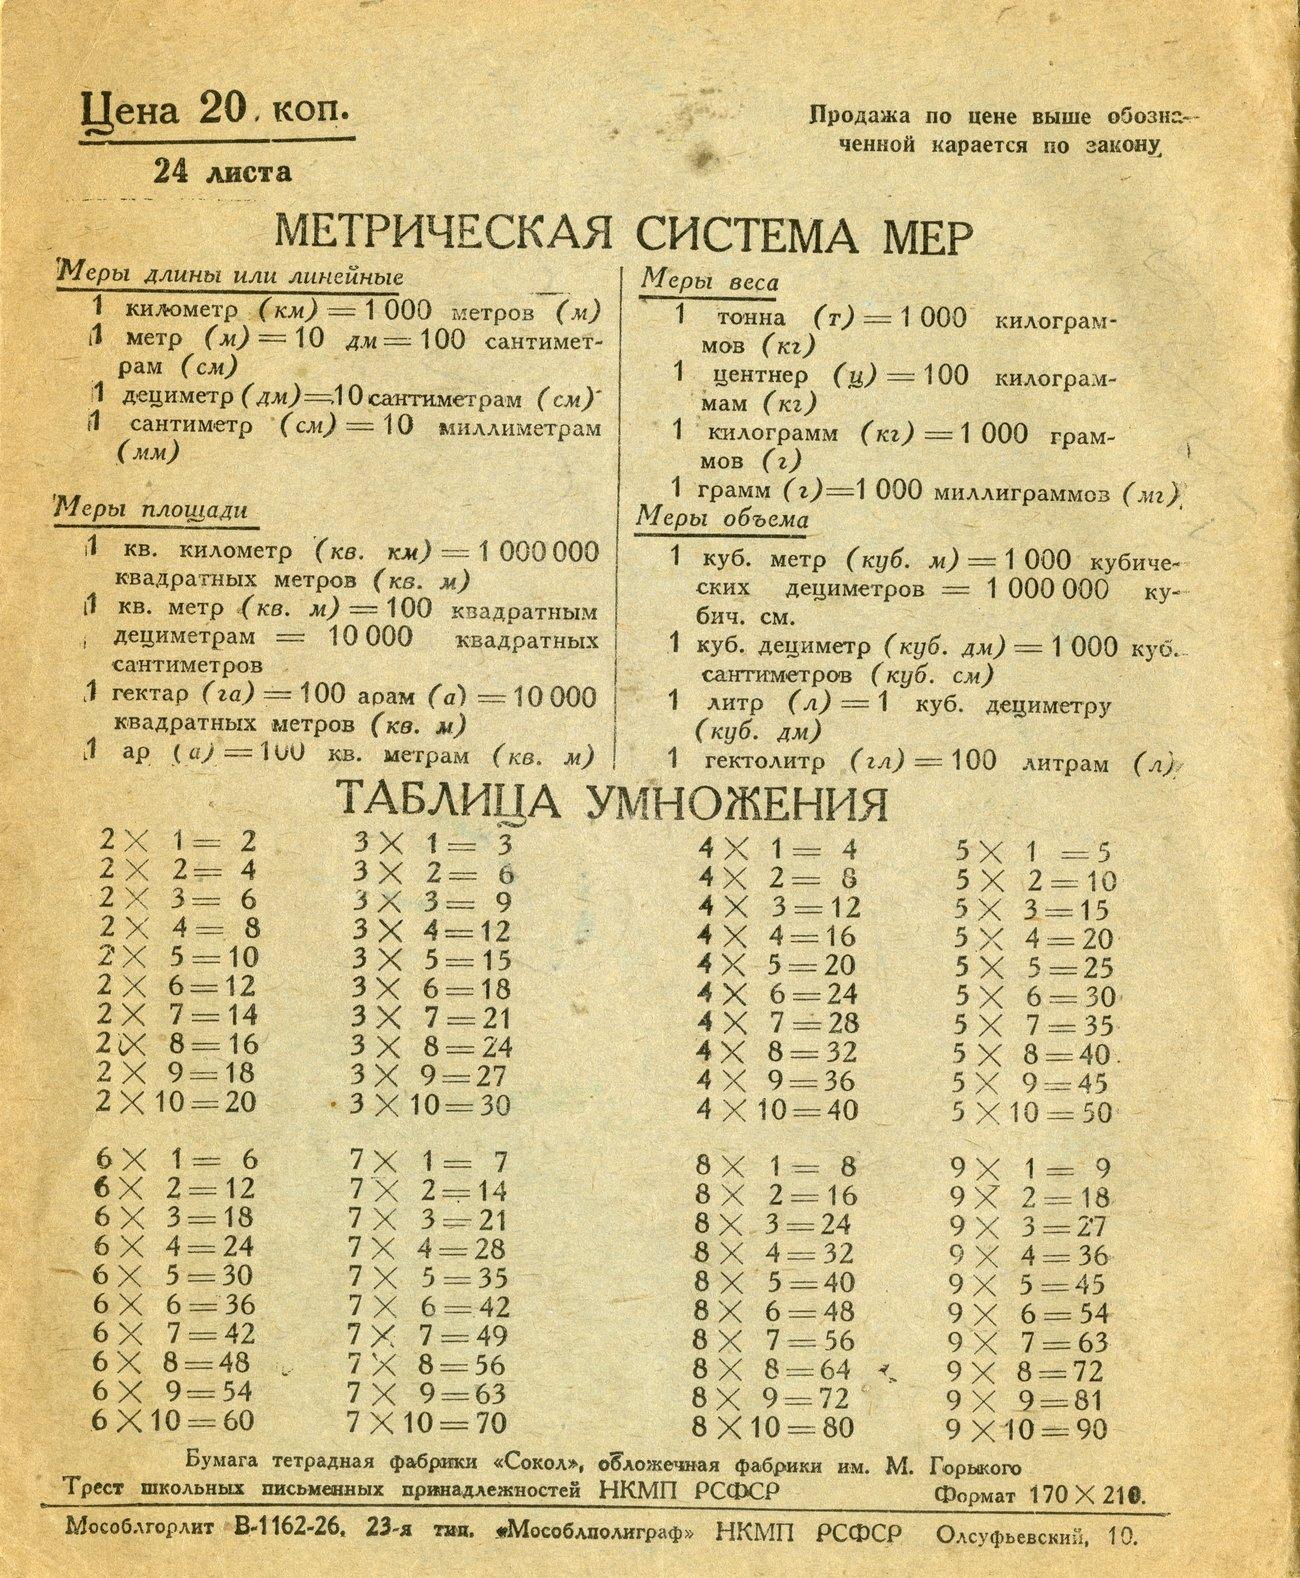 Тетрадь СССР 33 оборот